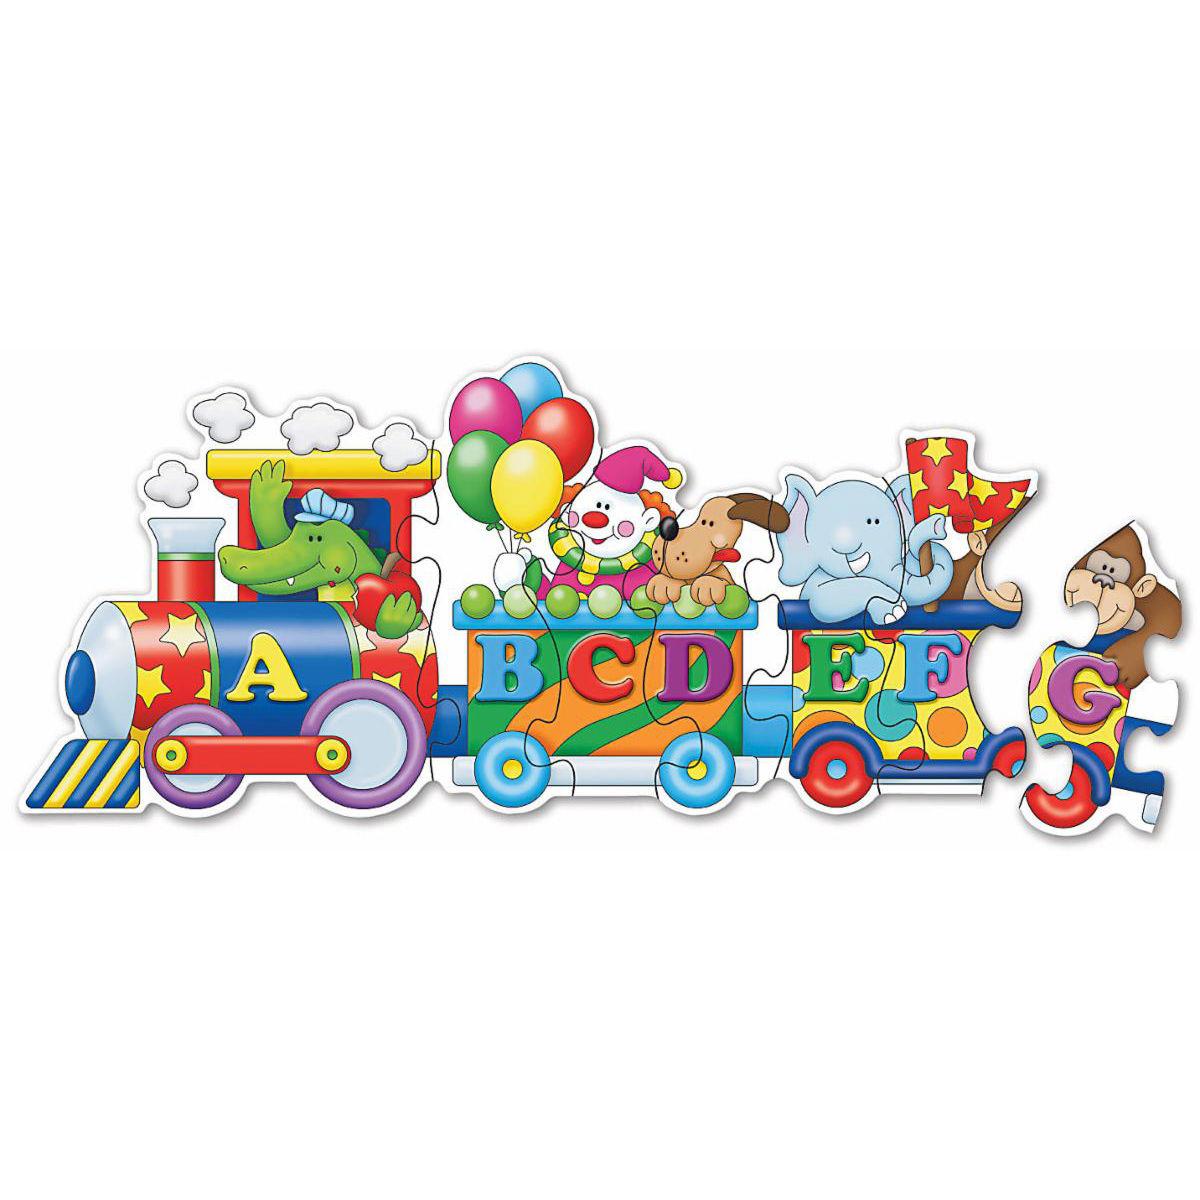 Картинка паровозик с буквами